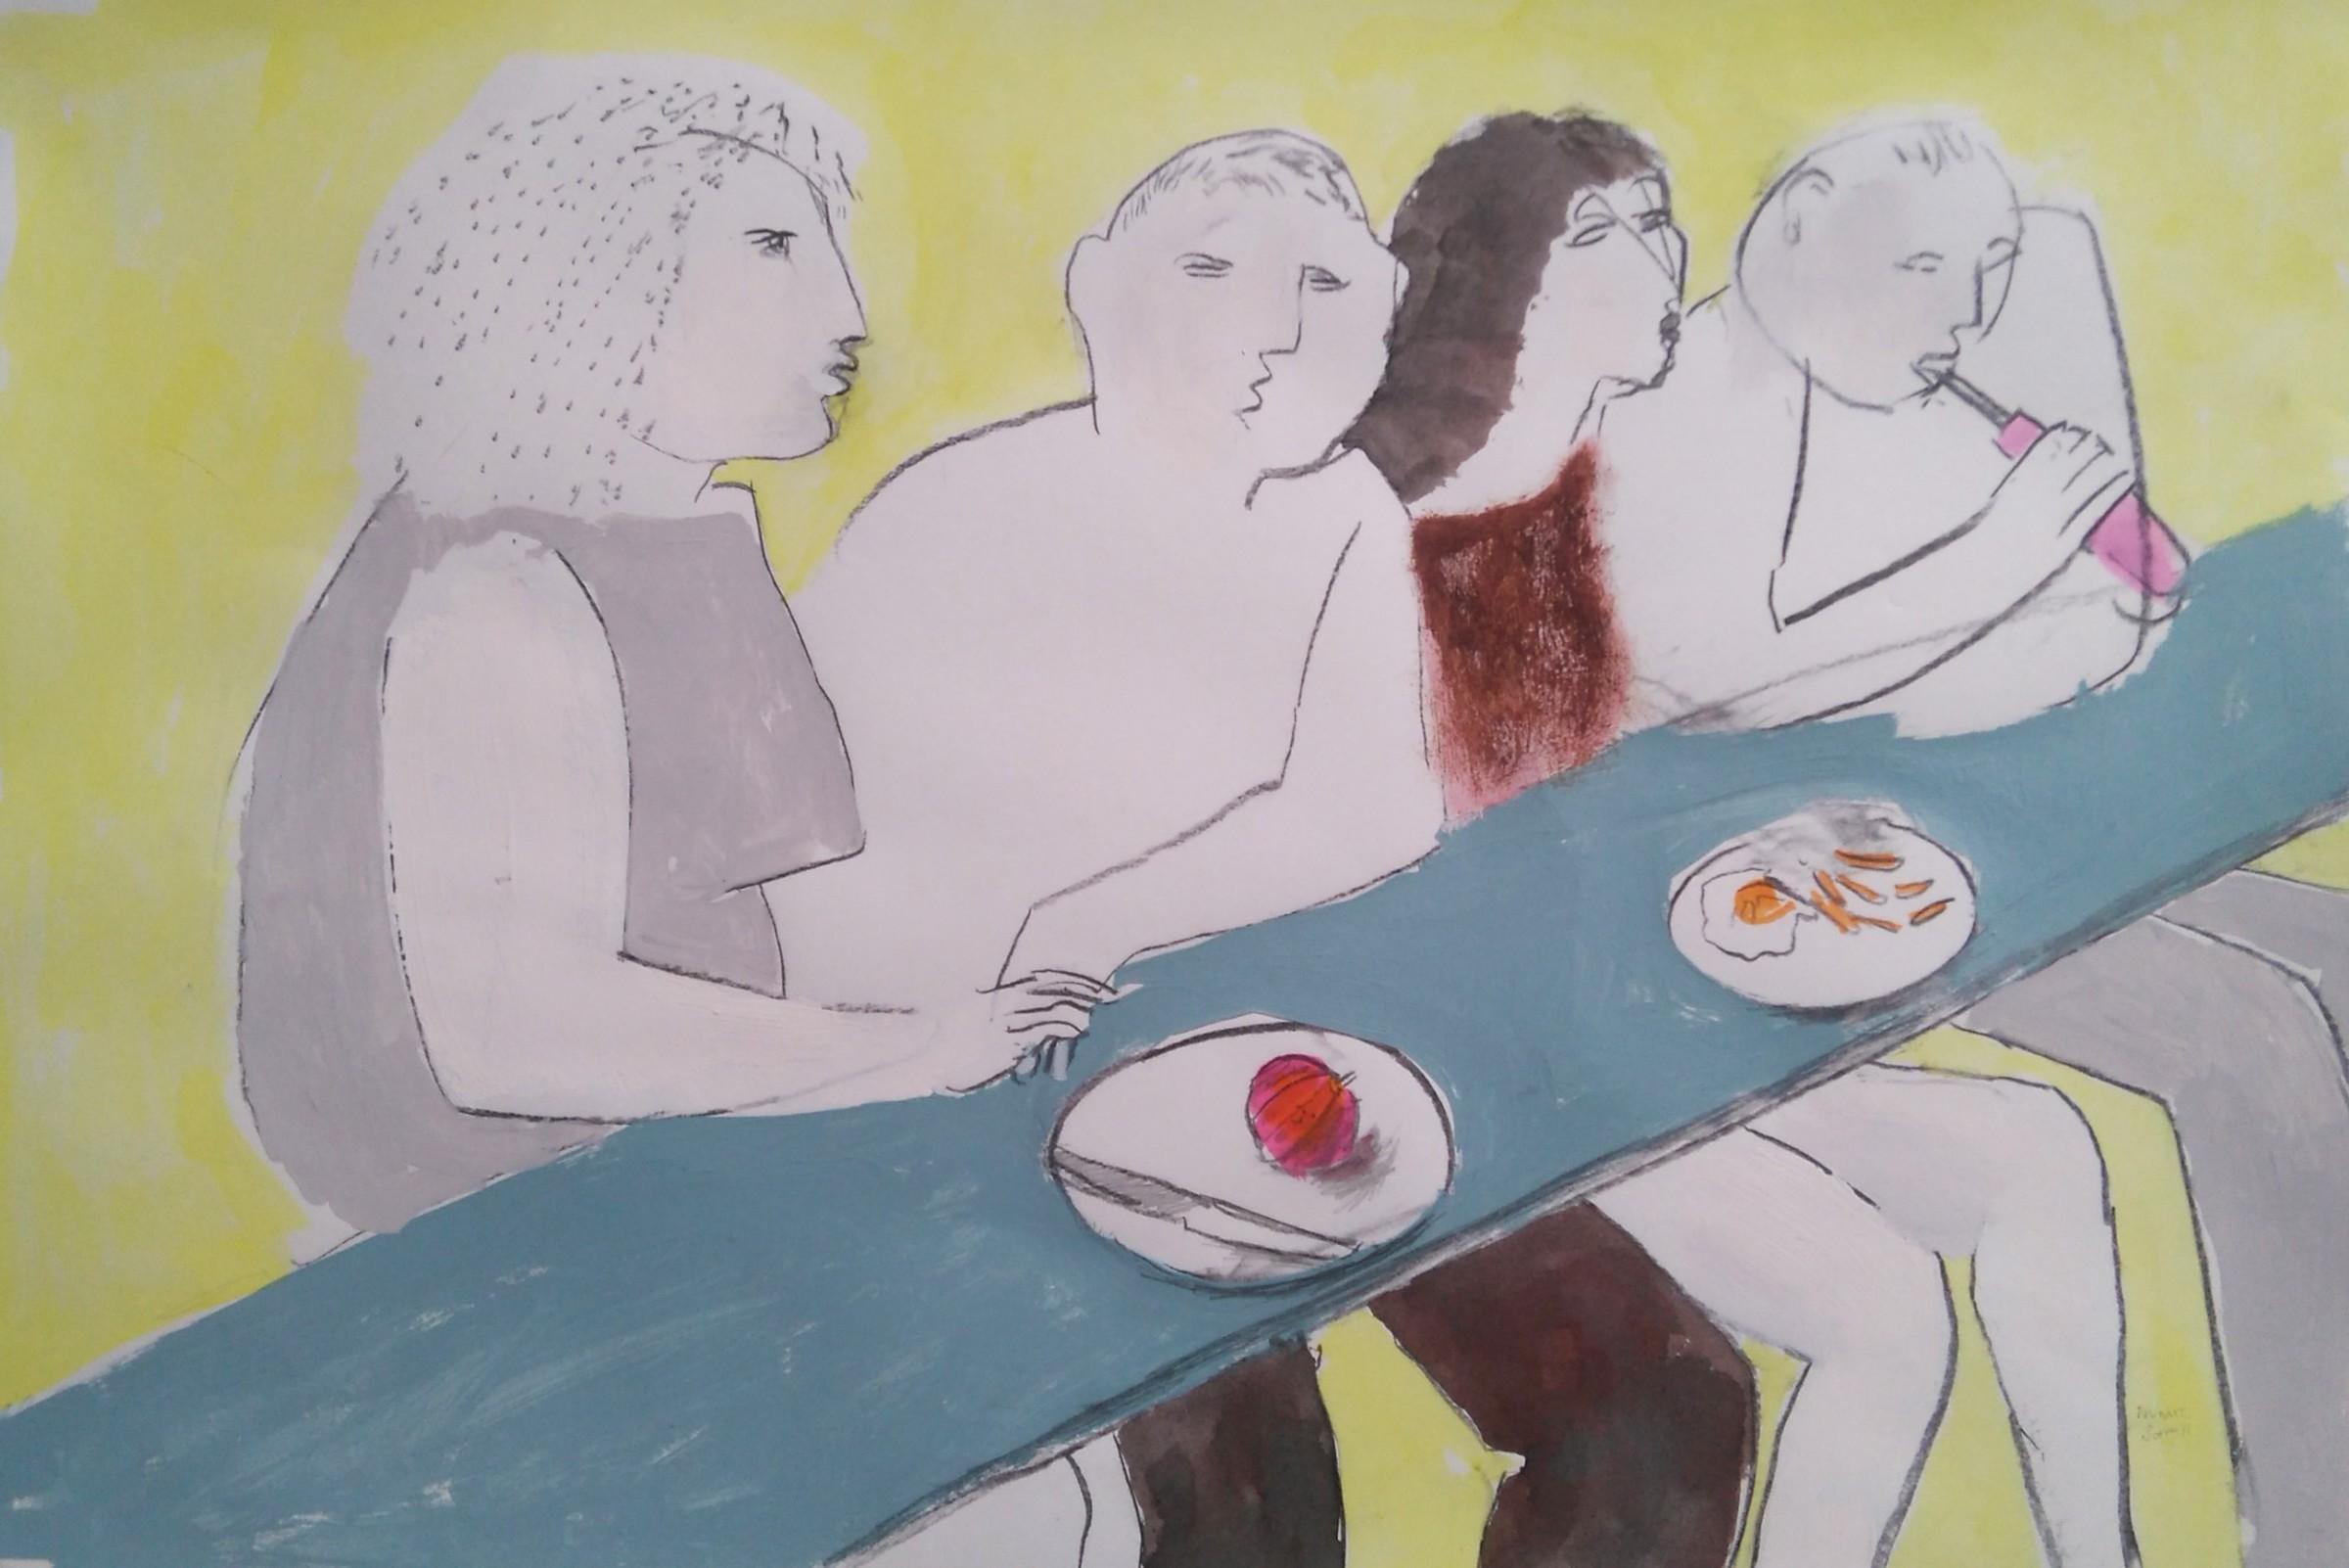 <span class=&#34;link fancybox-details-link&#34;><a href=&#34;/exhibitions/24/works/artworks_standalone10803/&#34;>View Detail Page</a></span><div class=&#34;artist&#34;><span class=&#34;artist&#34;><strong>Richard Sorrell</strong></span></div><div class=&#34;title&#34;><em>Lunch Bar</em></div><div class=&#34;medium&#34;>watercolour & charcoal</div>